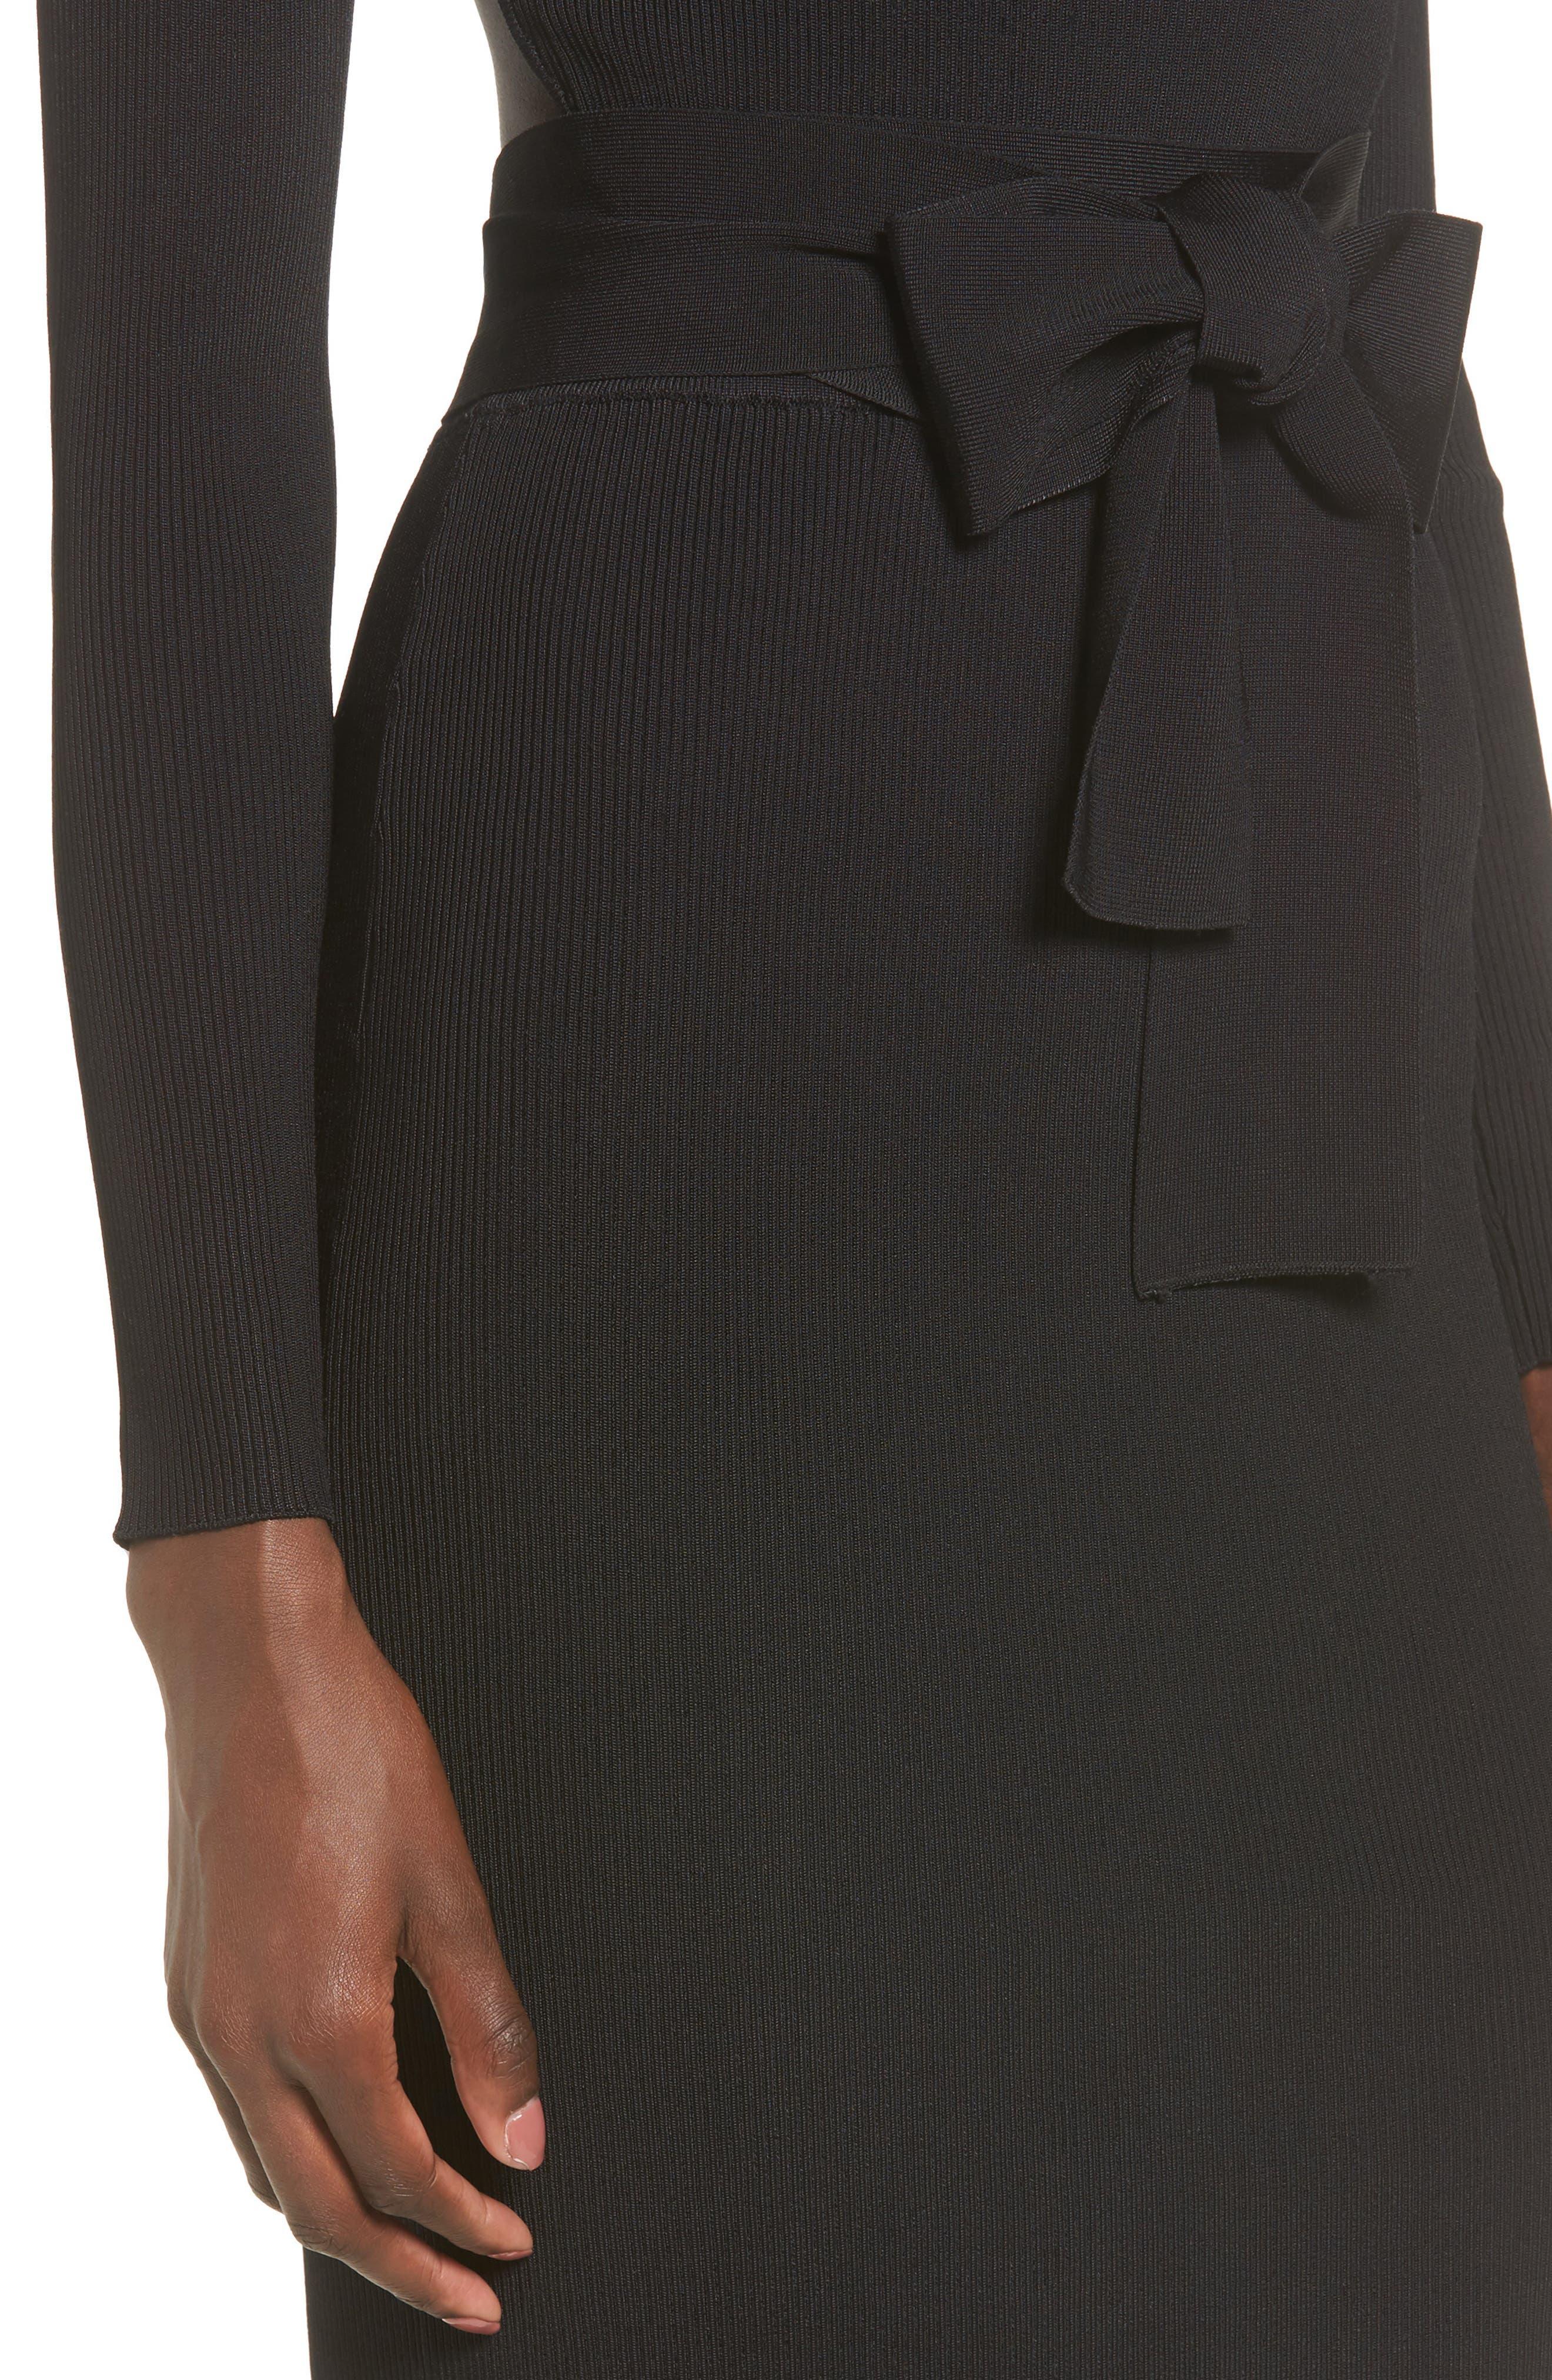 Desiree Cutout Ribbed Body-Con Dress,                             Alternate thumbnail 4, color,                             001